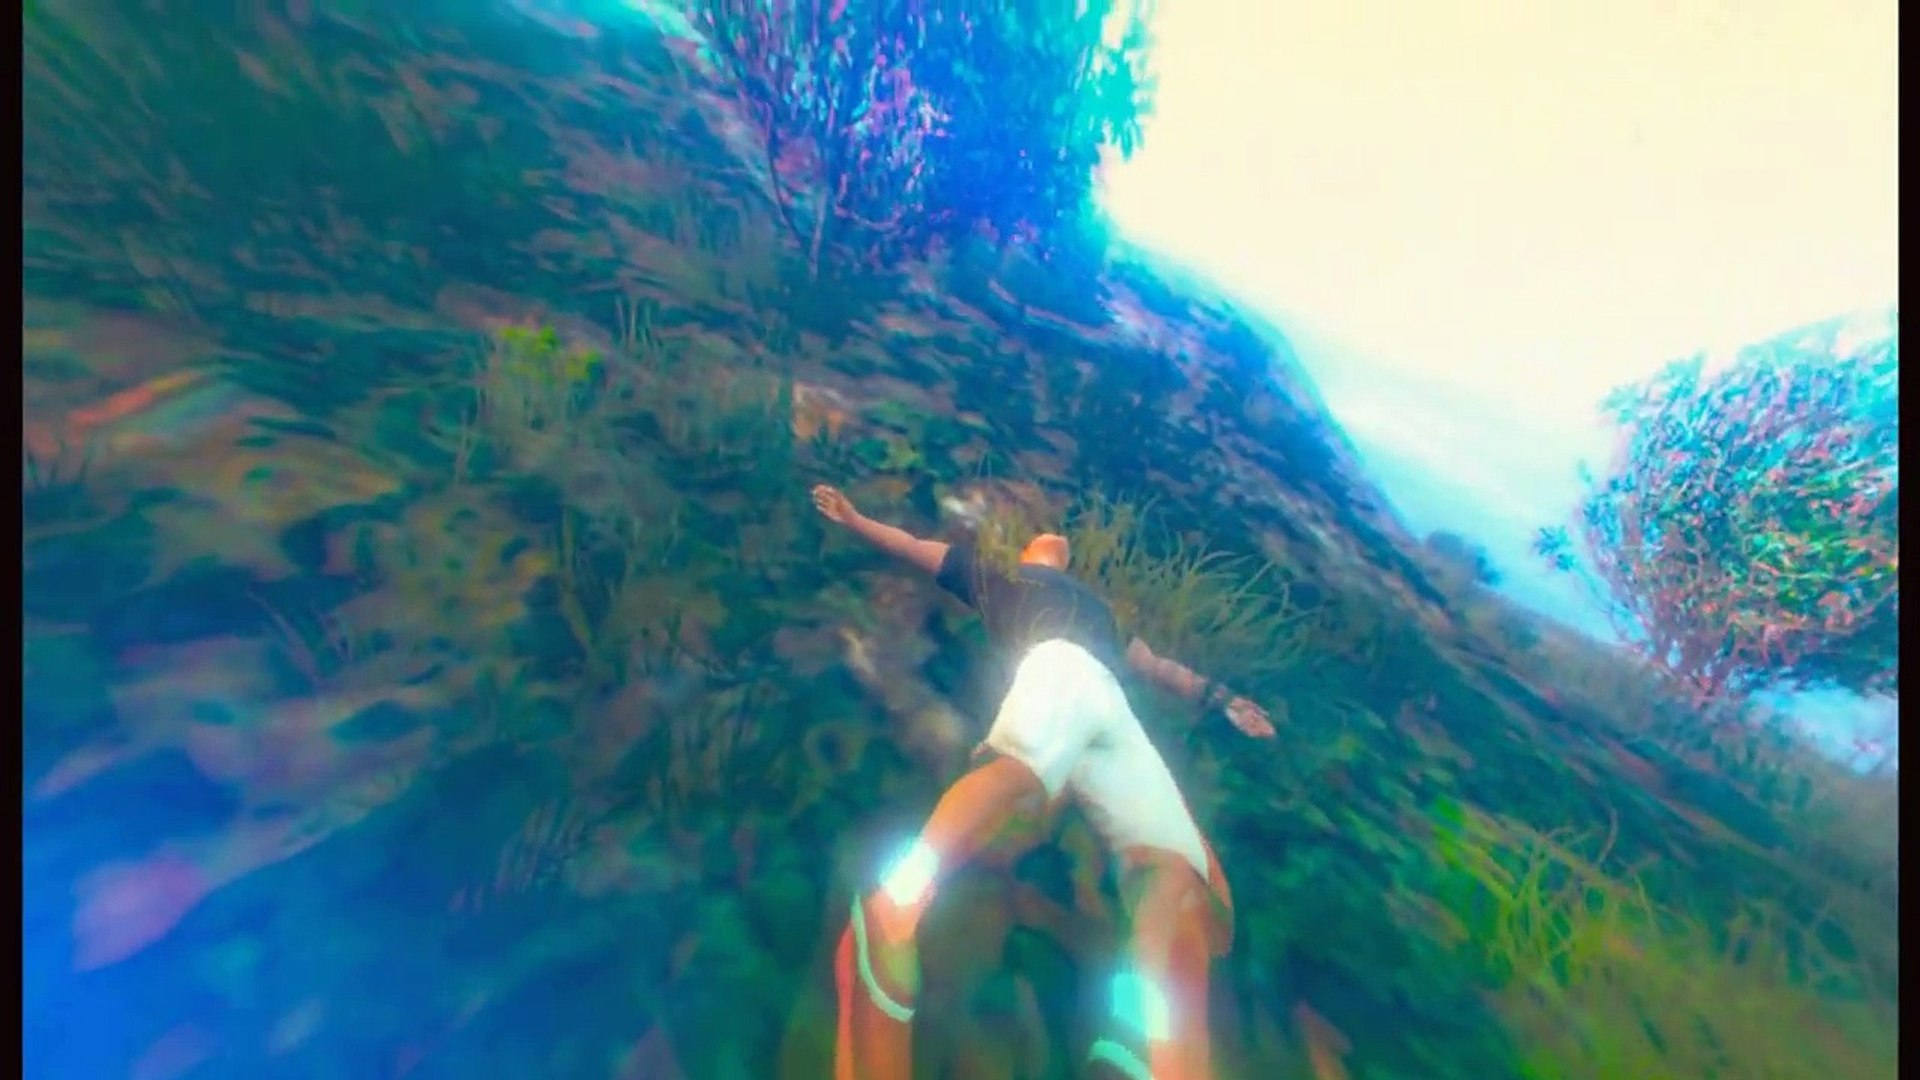 GTA 5 EASTER EGGS - NEW PEYOTE PLANTS & ANIMALS DISCOVERED!? (GTA 5 Secrets)